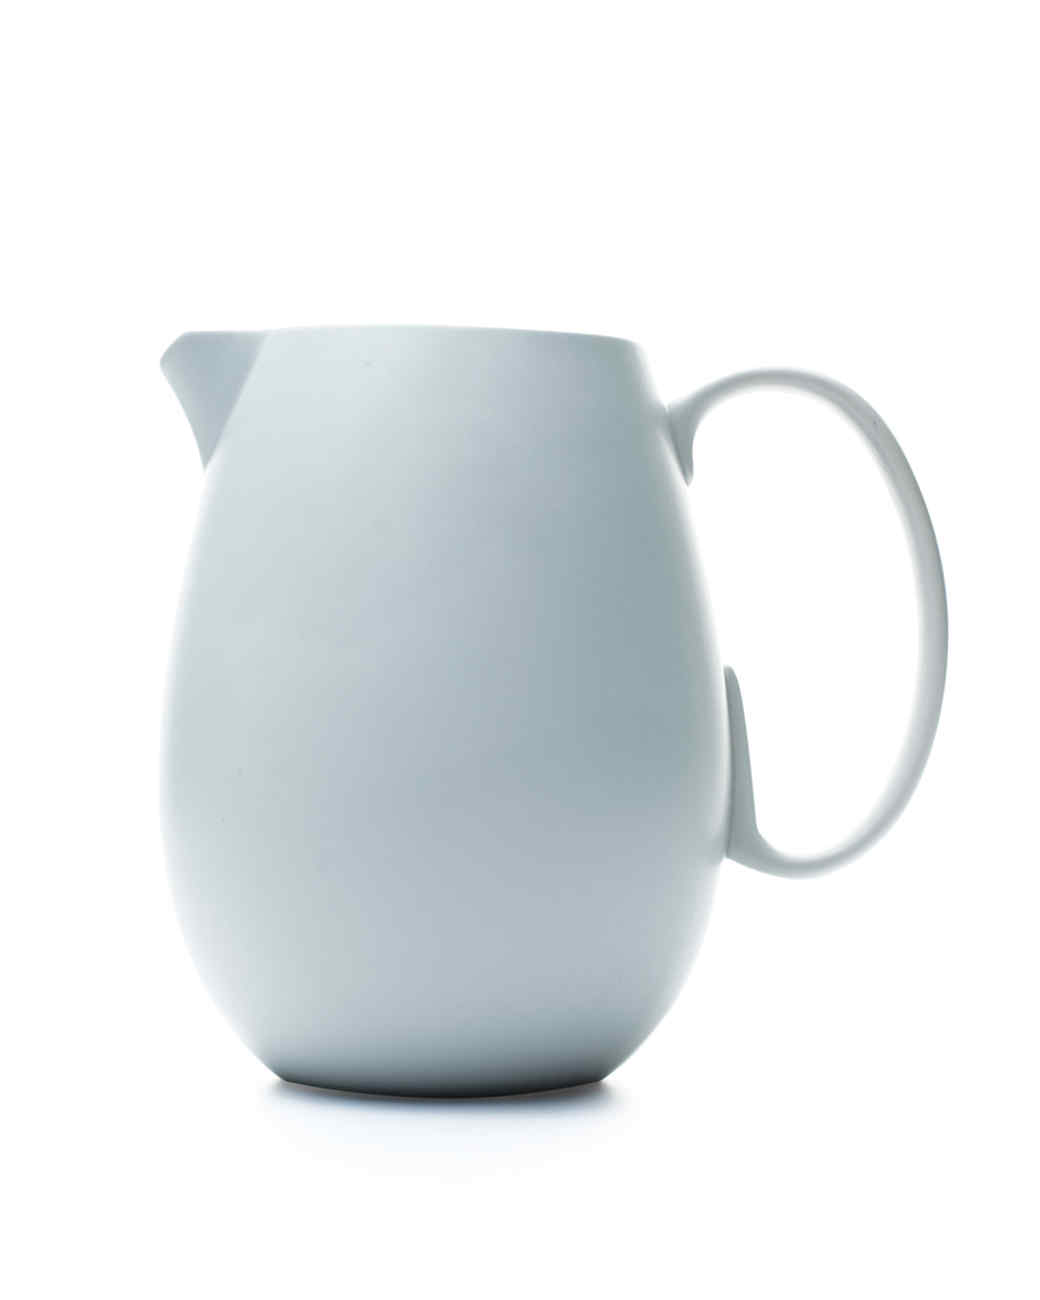 easy-entertaining-vera-pitcher-mld108950.jpg